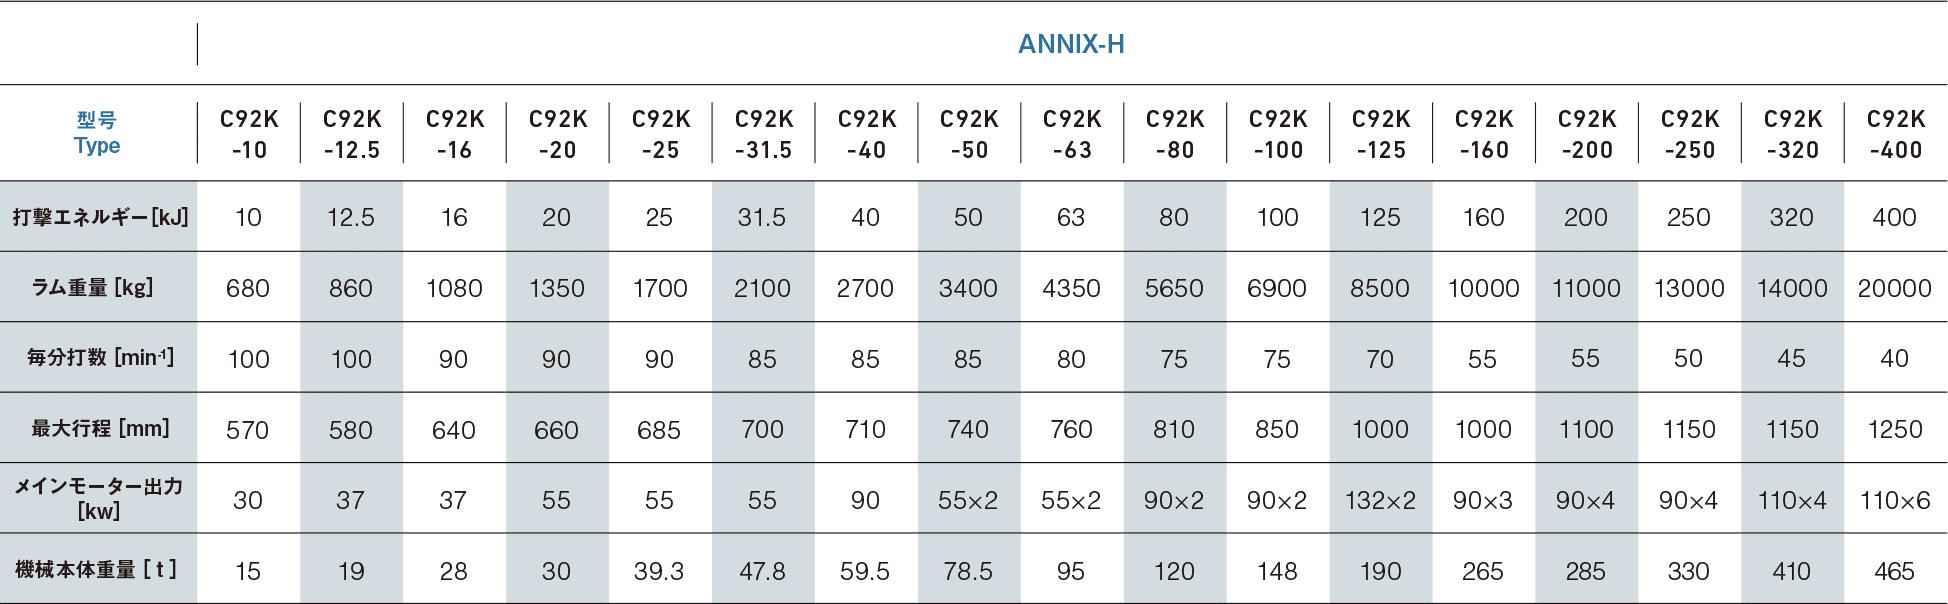 ANNIX-H 詳細